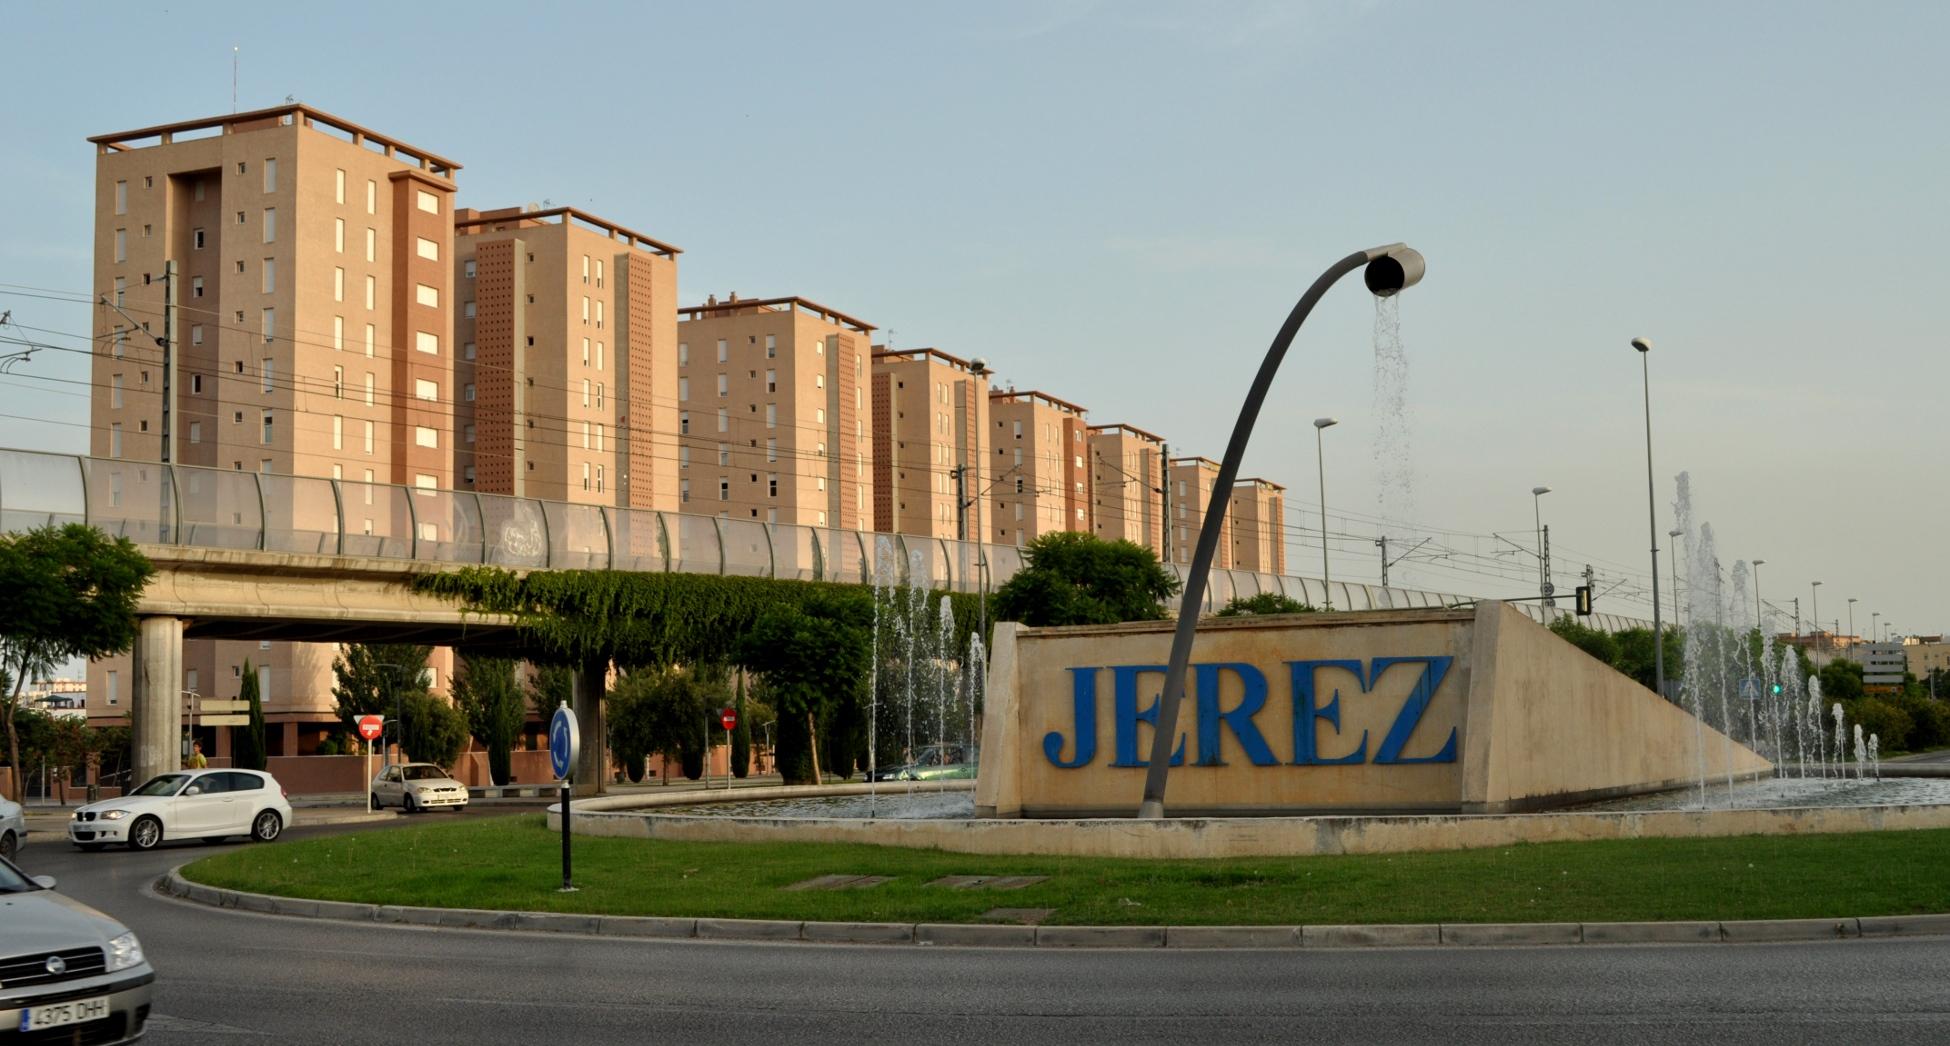 Image gallery jerez espana for Muebles en jerez dela frontera cadiz